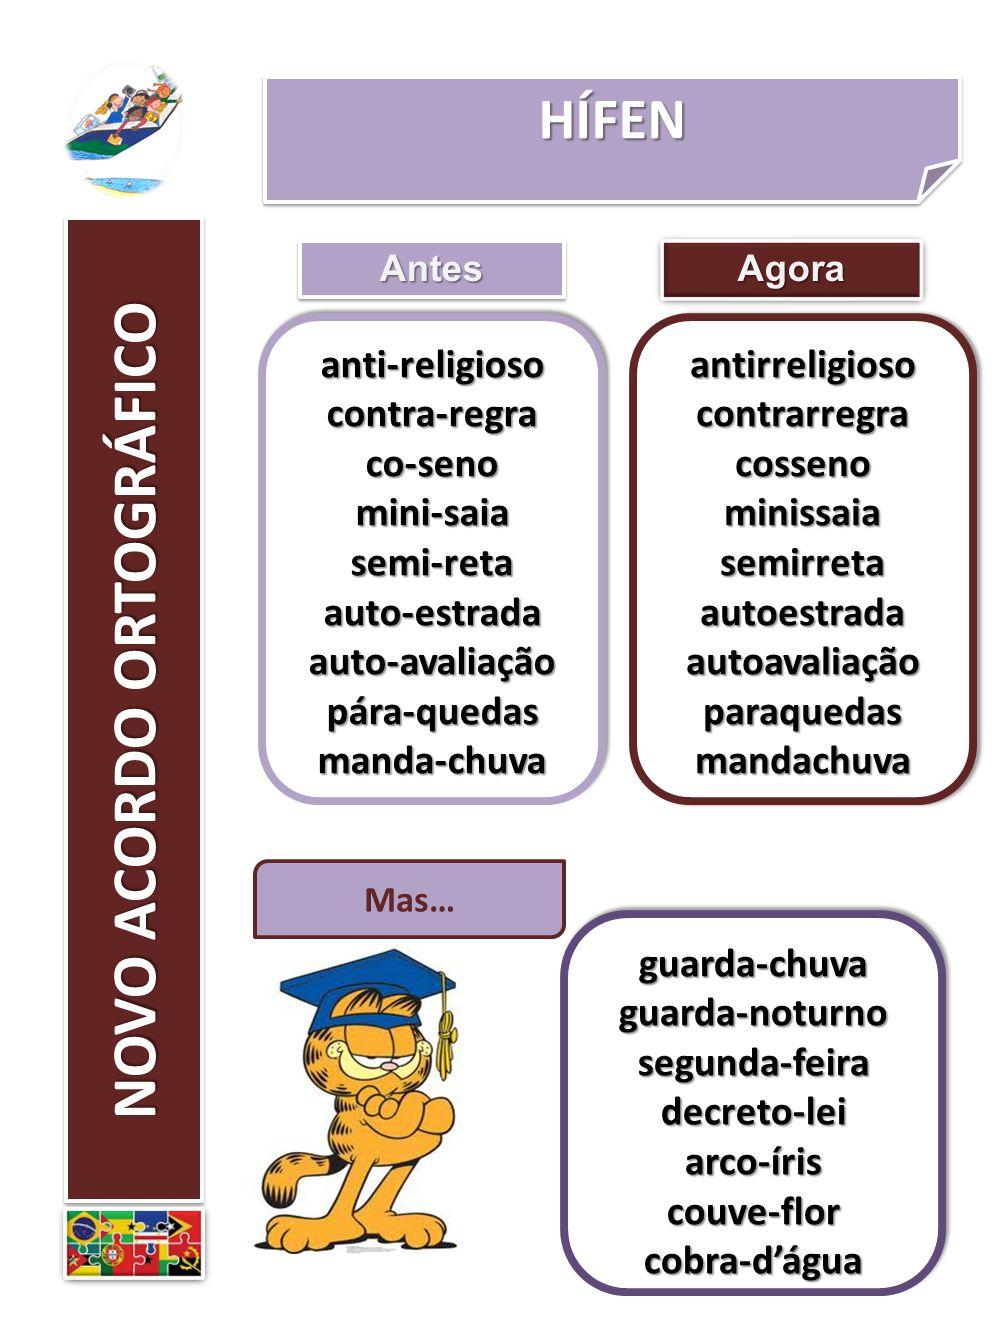 HÍFENHÍFEN AntesAntes anti-religiosocontra-regraco-senomini-saiasemi-retaauto-estradaauto-avaliaçãopára-quedasmanda-chuvaanti-religiosocontra-regraco-